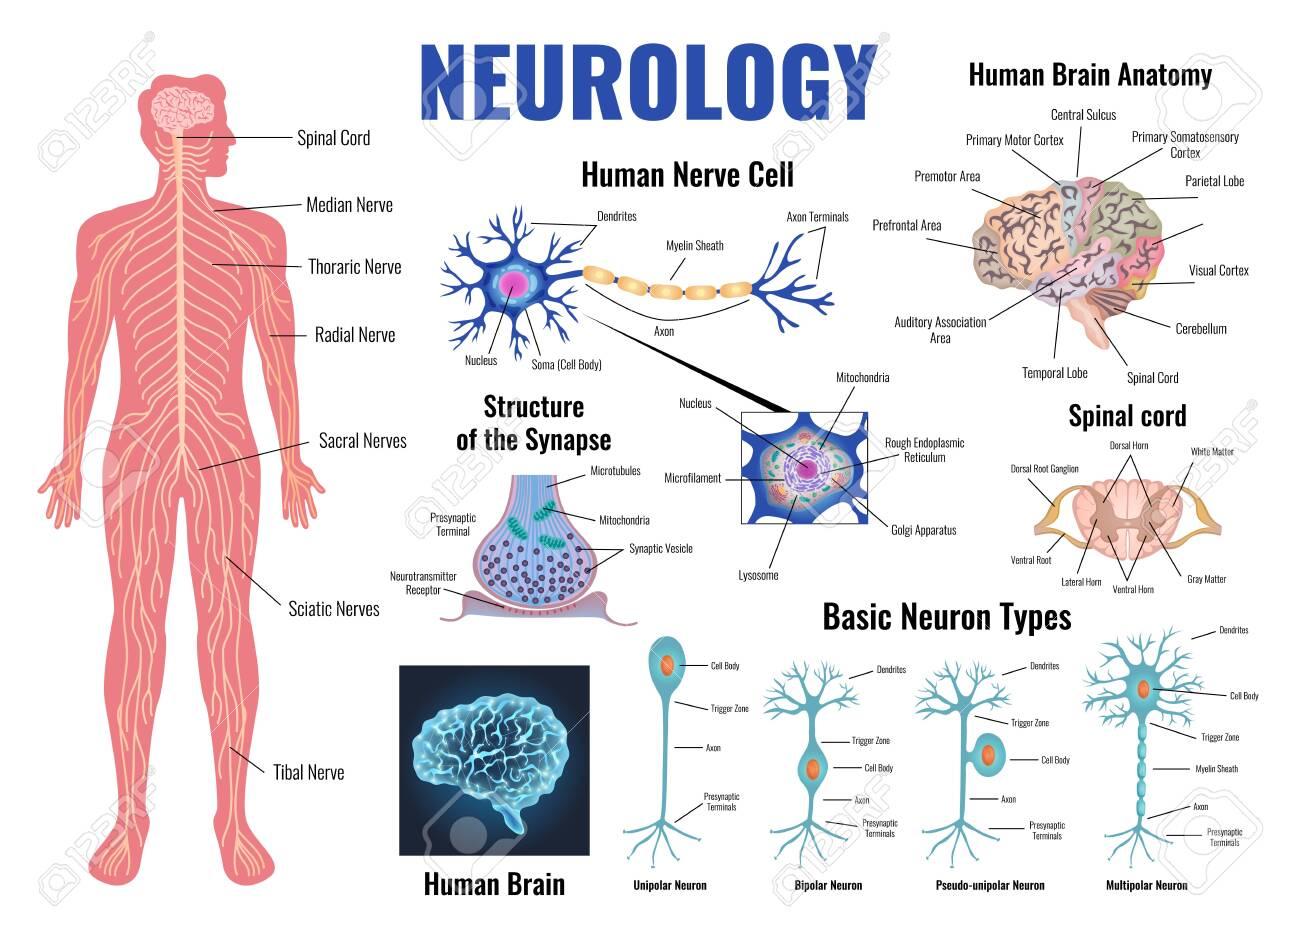 Neurology and human brain anatomy set flat isolated vector illustration - 126115728